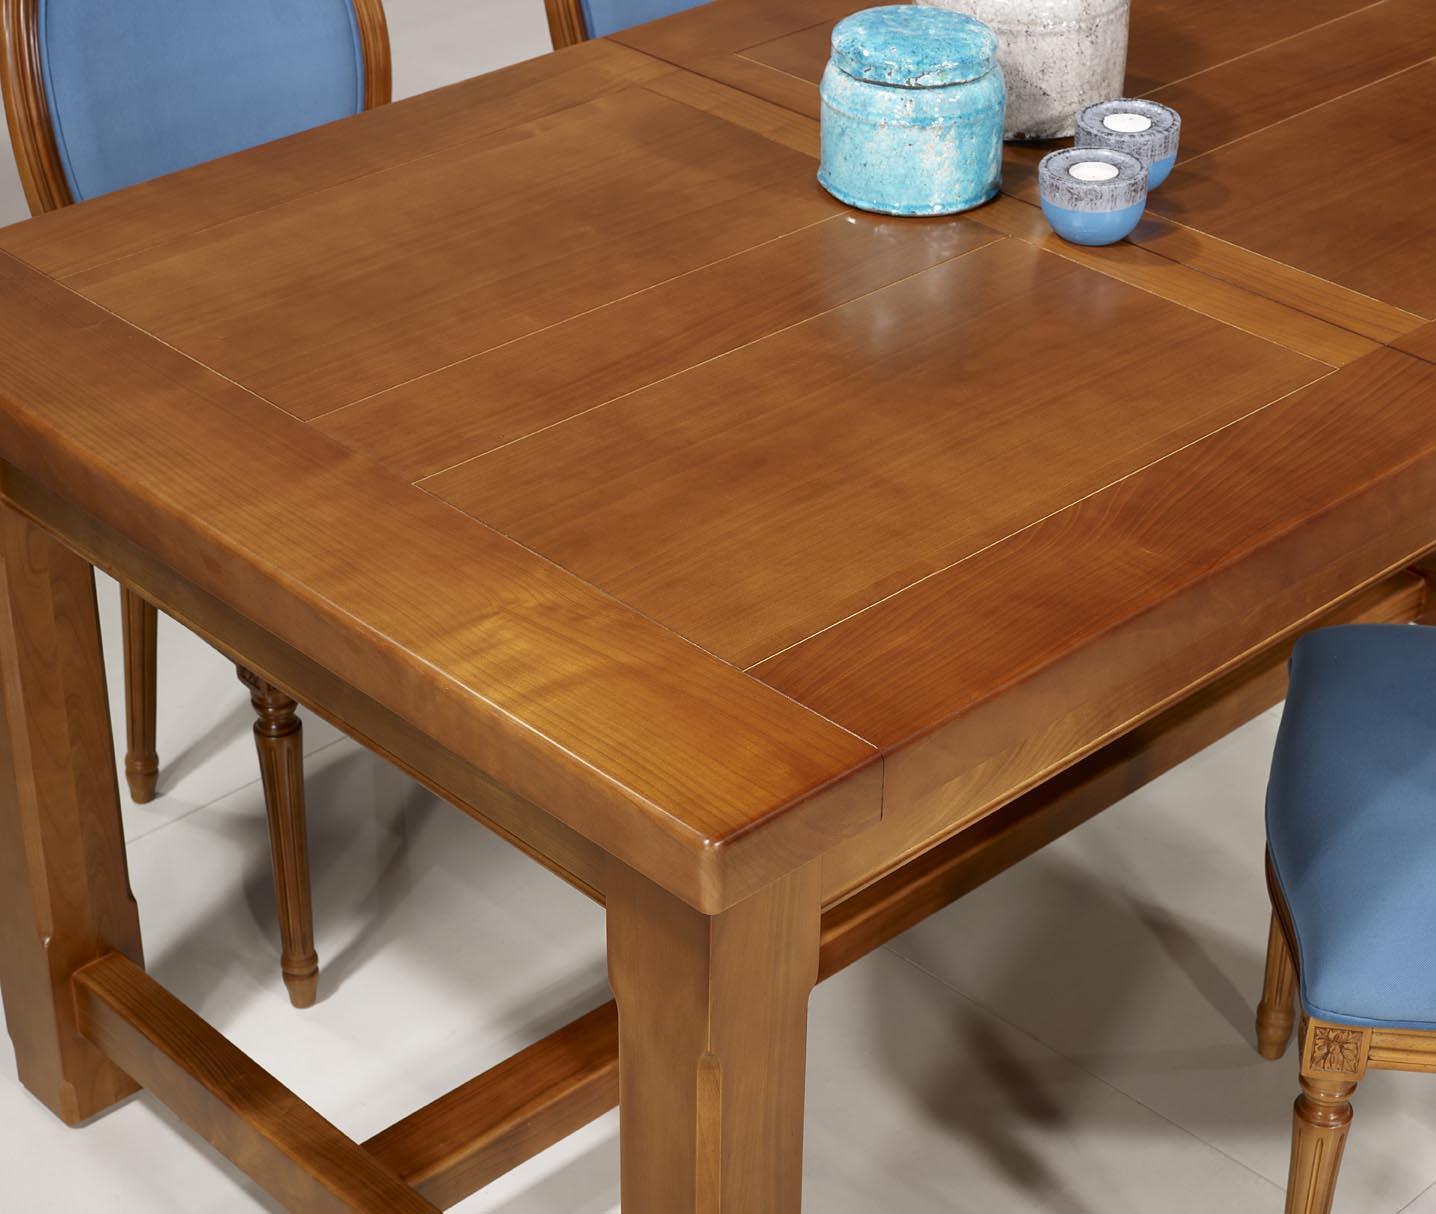 table de ferme rectangulaire mathis ralise en merisier massif 160x100 2 allonges de 40 cm - Table Merisier Massif